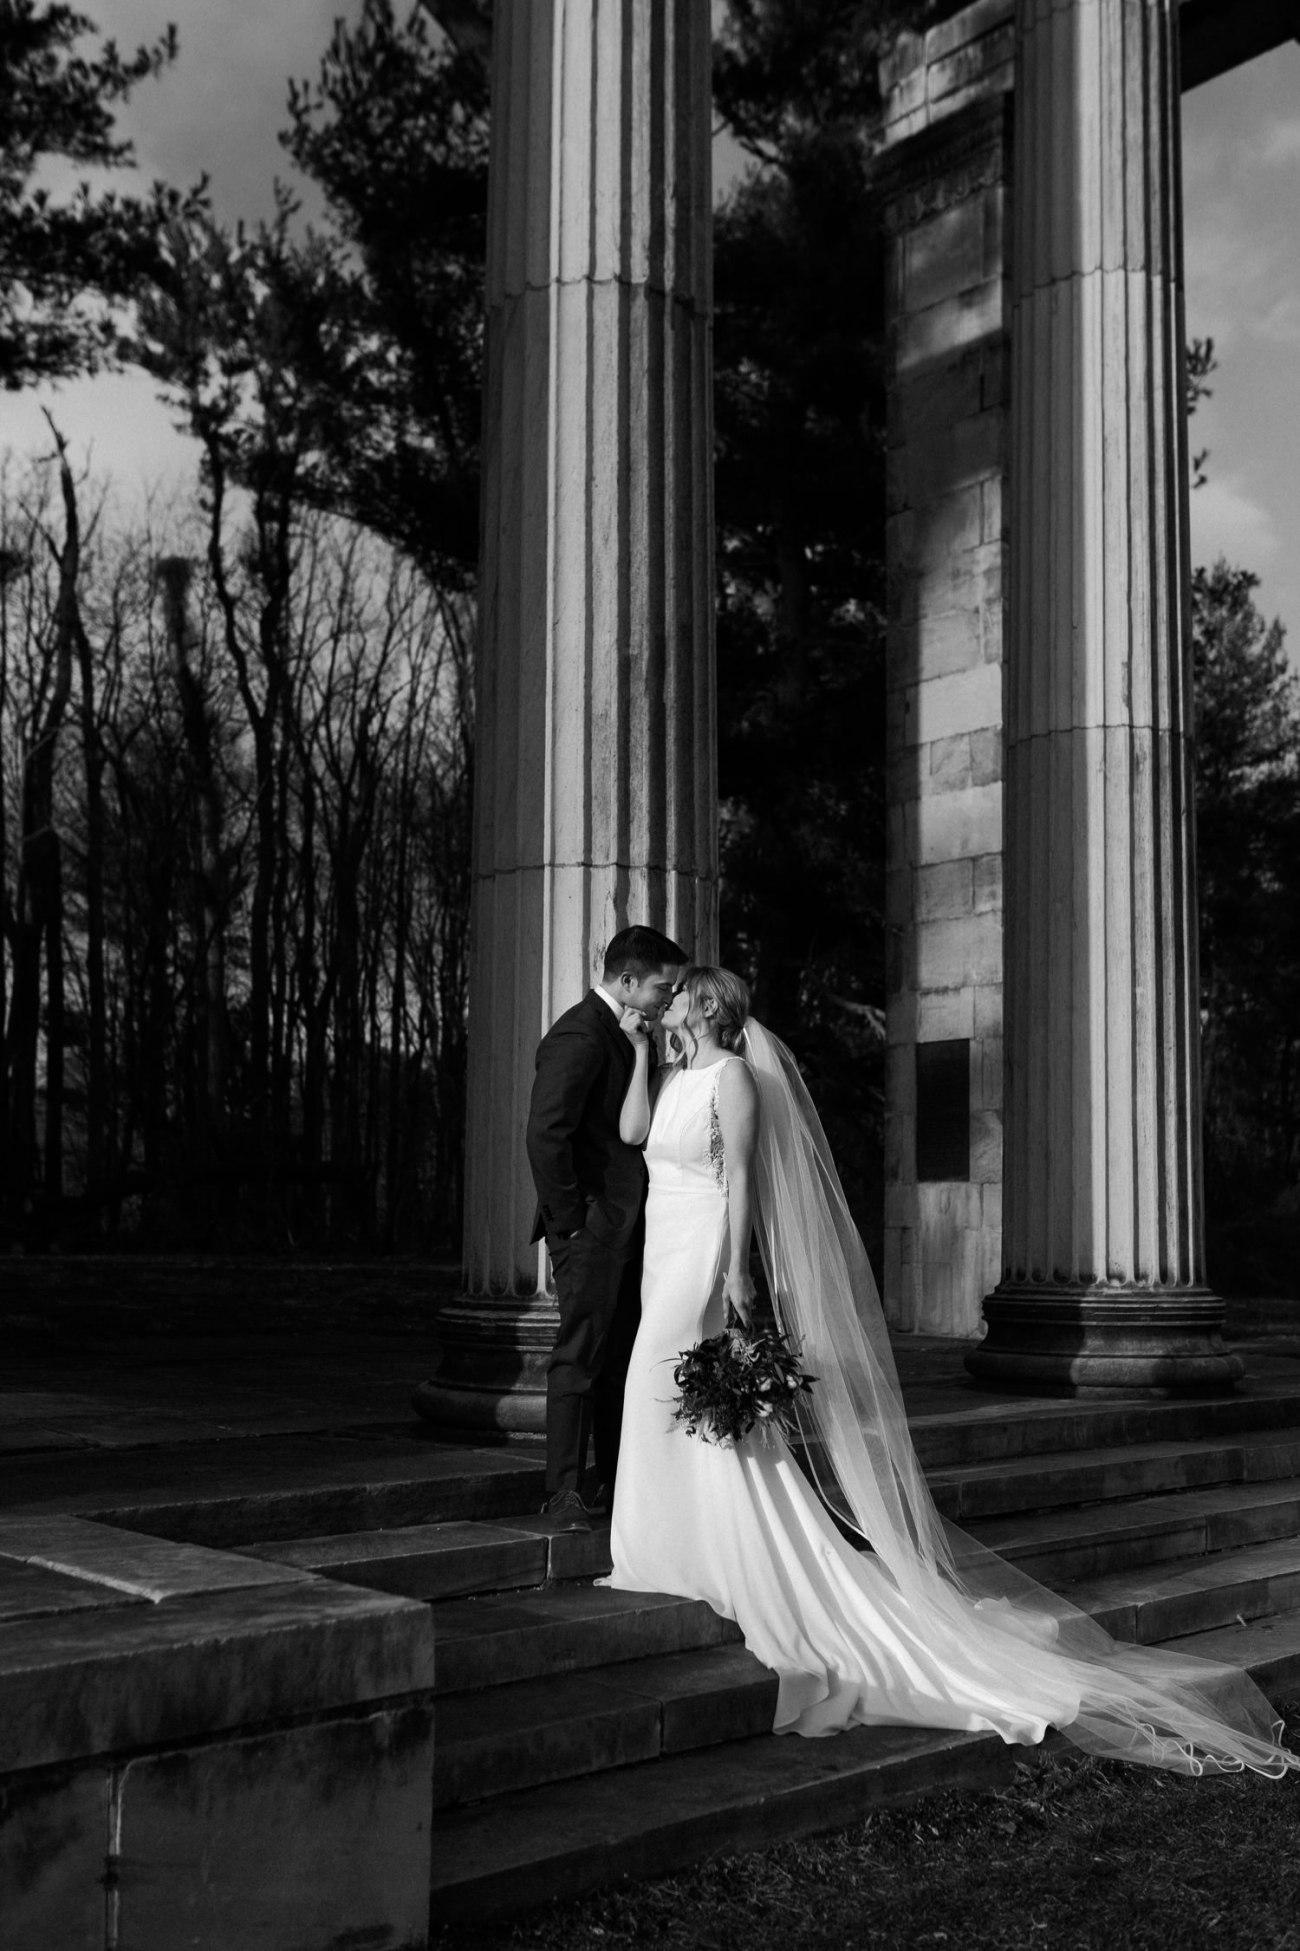 Princeton Battlefield Wedding Princeton University Elopement New Jersey Wedding Photographer Anais Possamai Photography 26